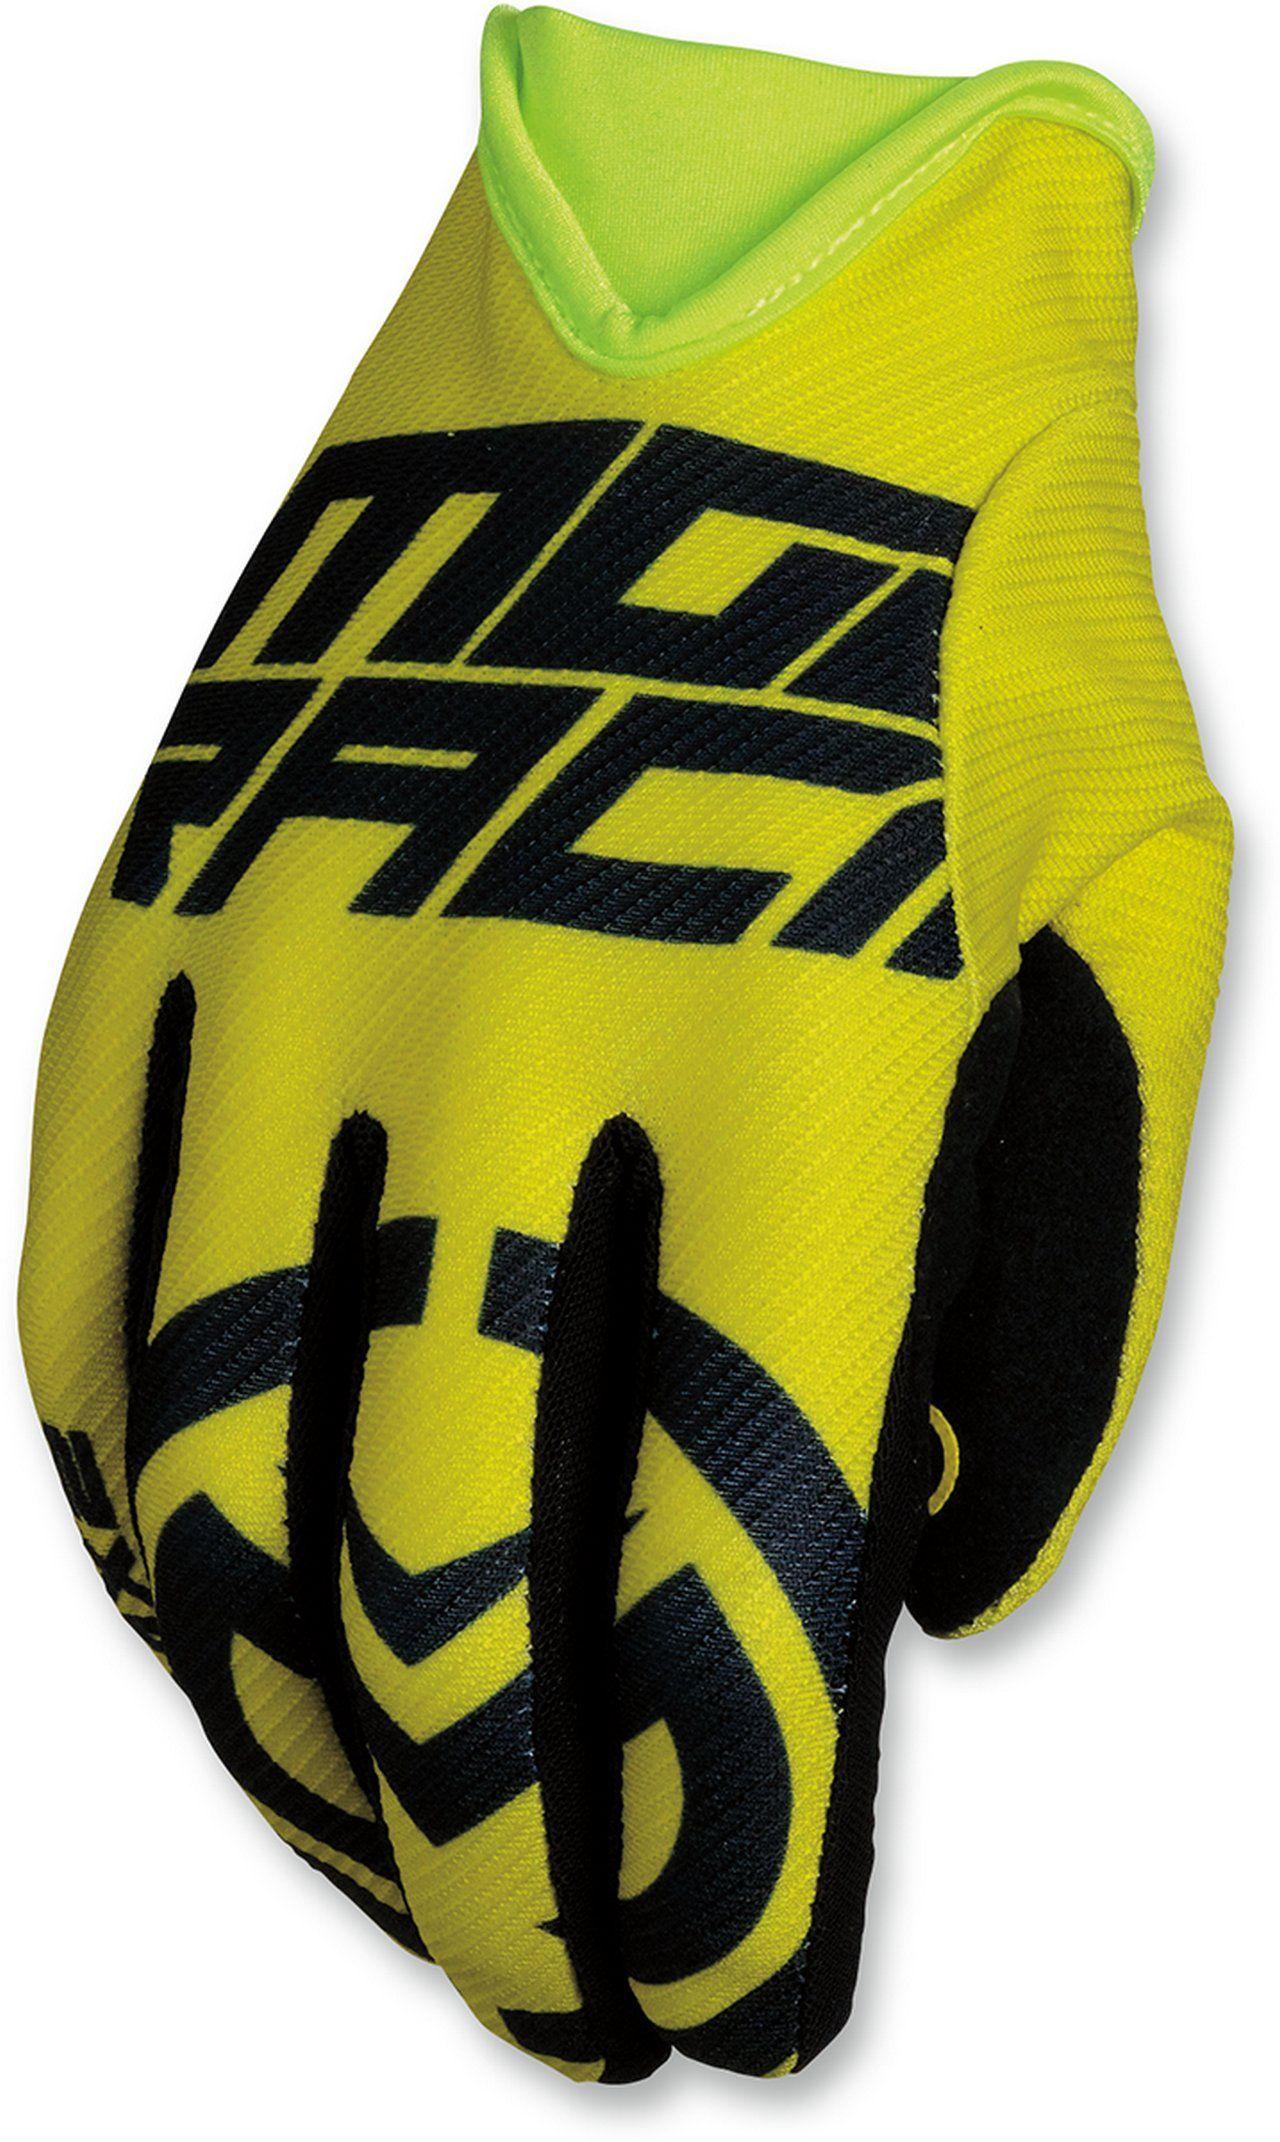 【MOOSE RACING】MX2 手套 [3330-4554] - 「Webike-摩托百貨」